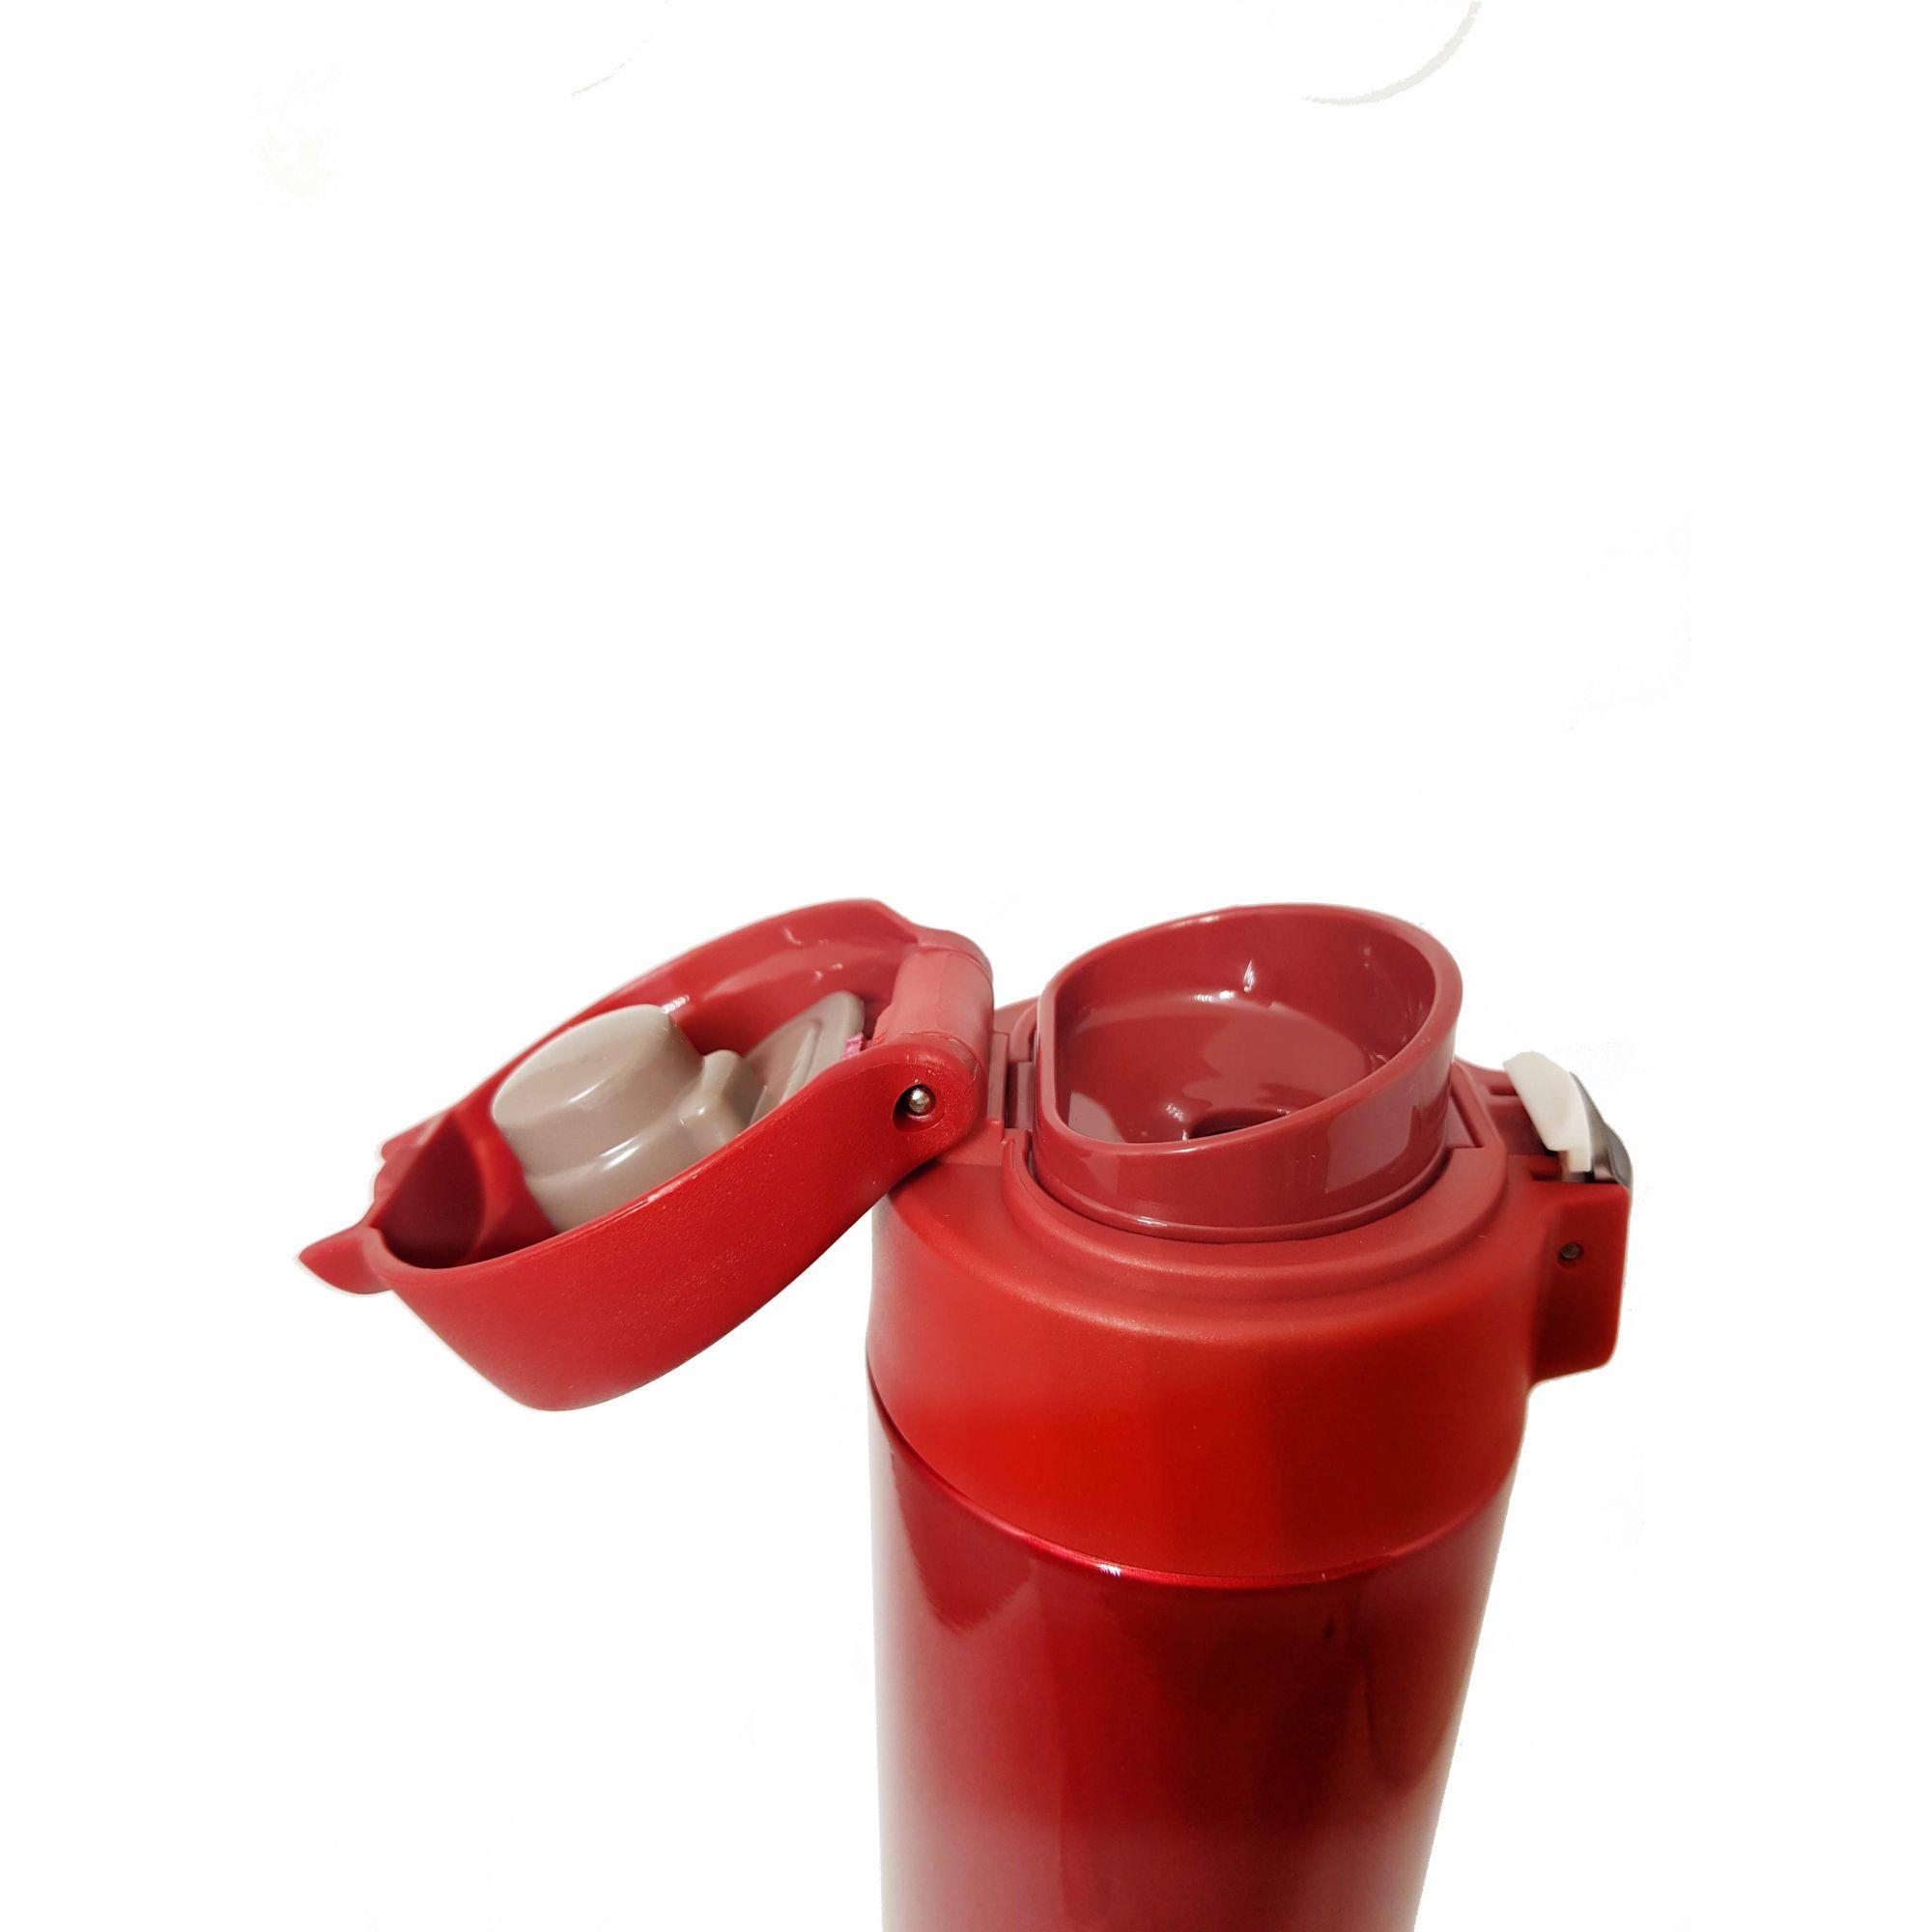 Garrafa de Inox - Fast Click Vermelha